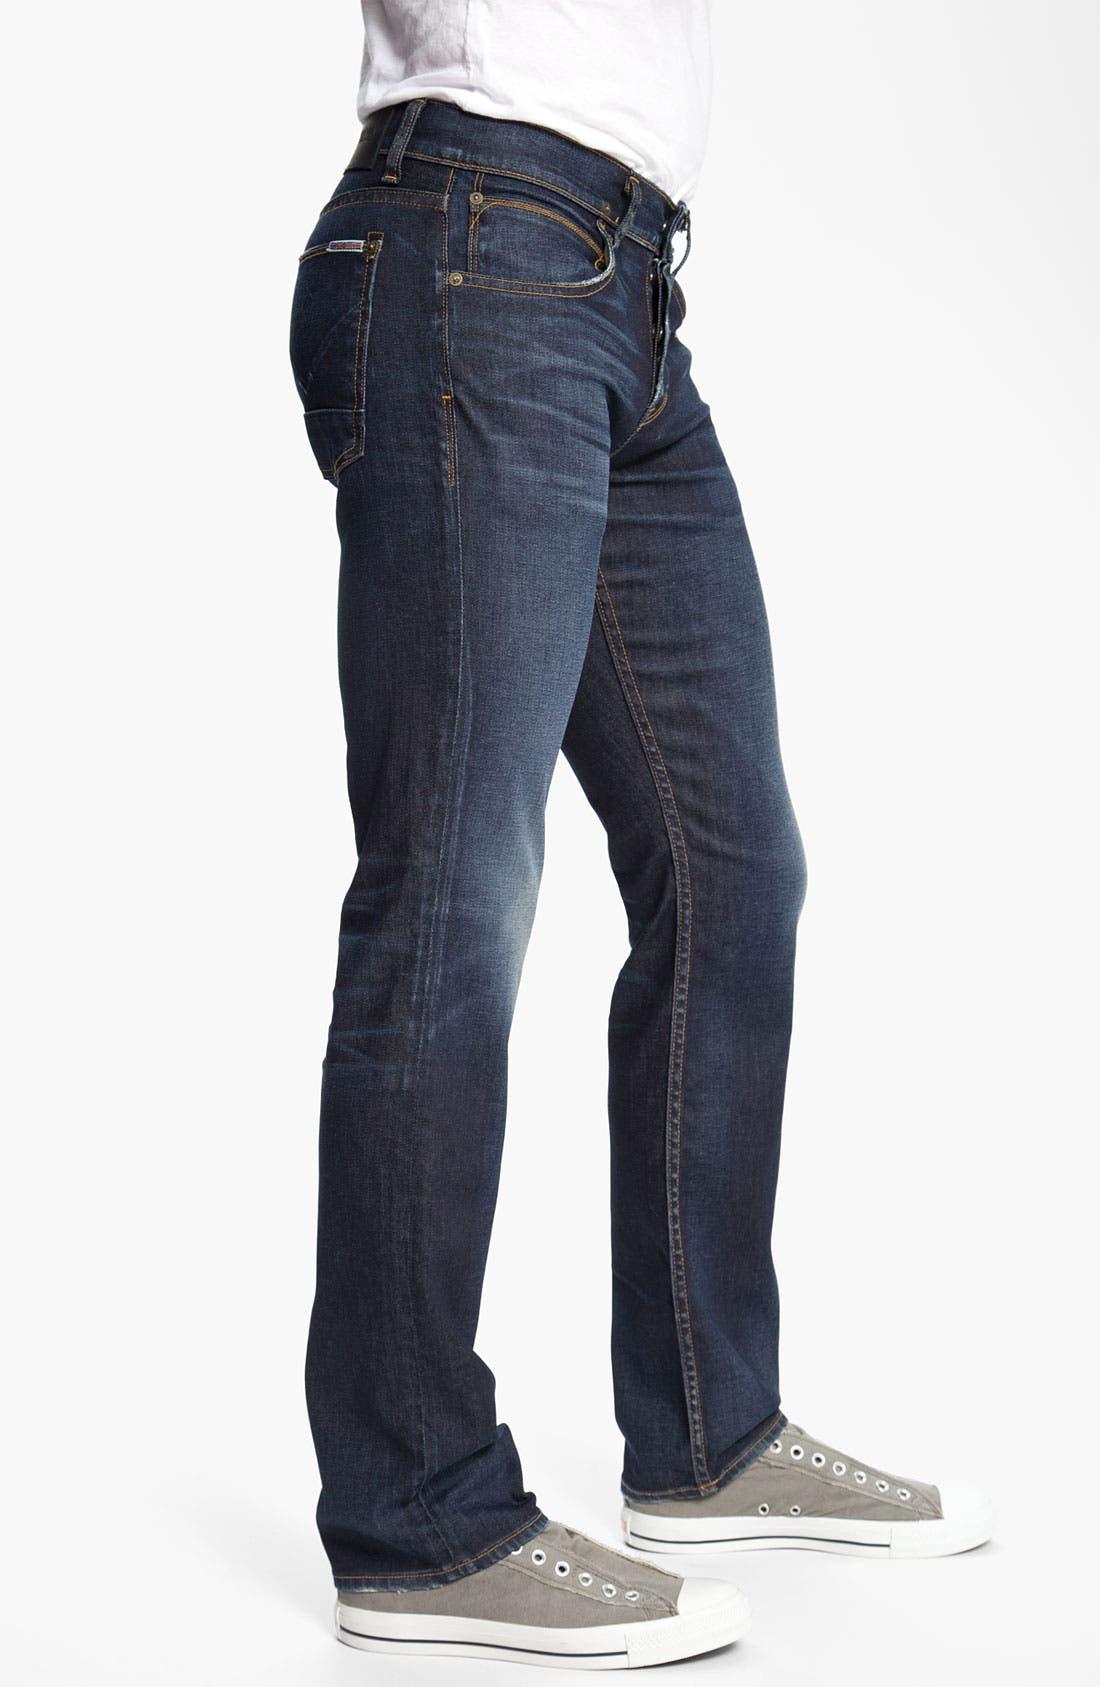 HUDSON JEANS,                             Hudson 'Byron' Slim Straight Leg Jeans,                             Alternate thumbnail 4, color,                             402